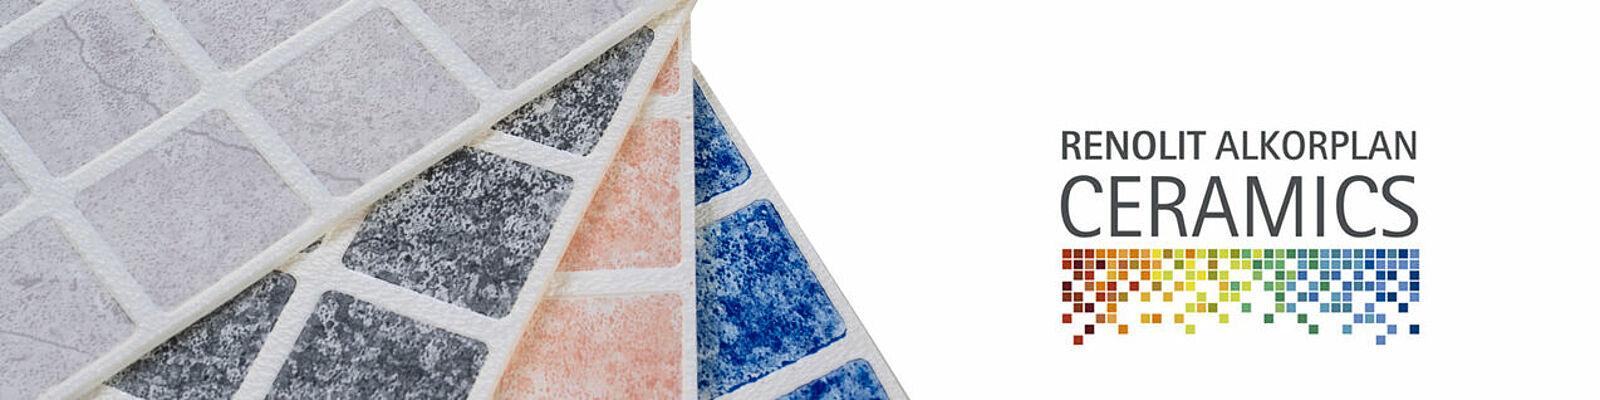 Fóliázott medence Ceramic fóliával